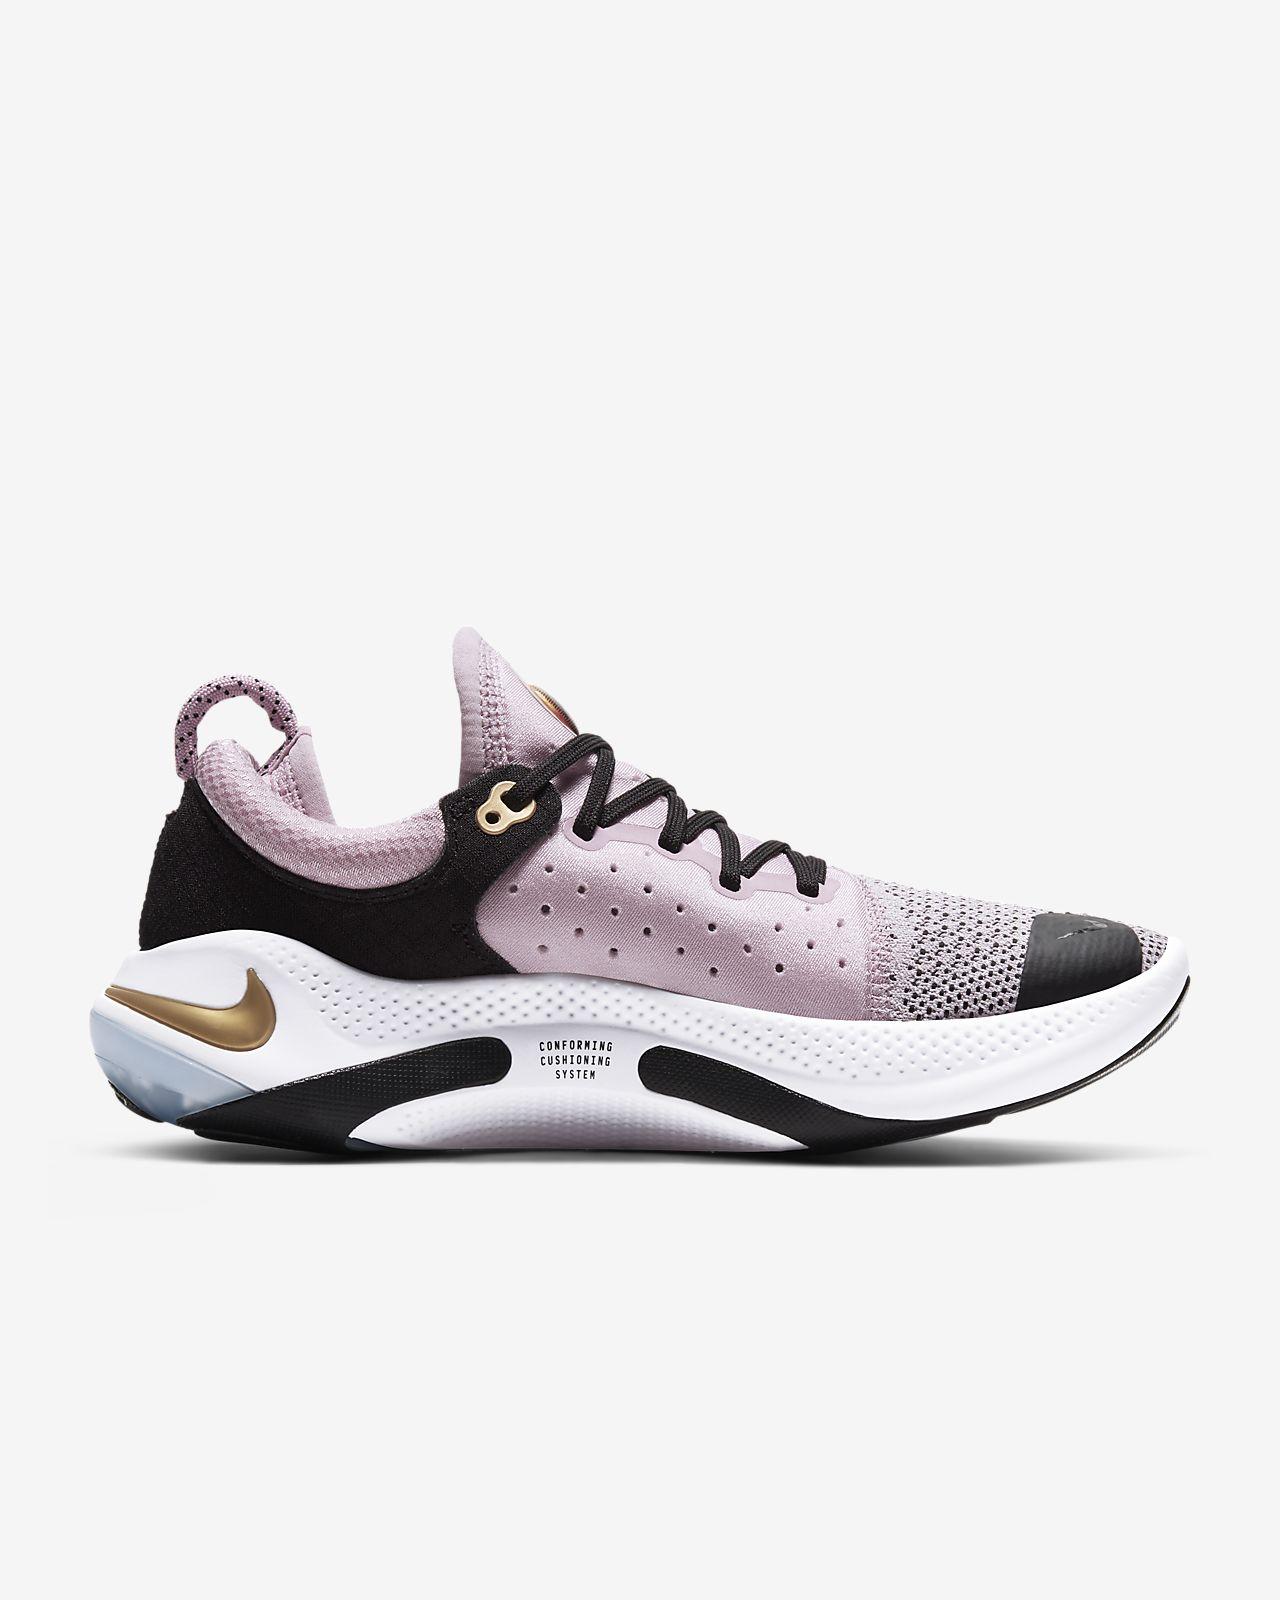 Nike Joyride Run Flyknit Women's Running Shoe